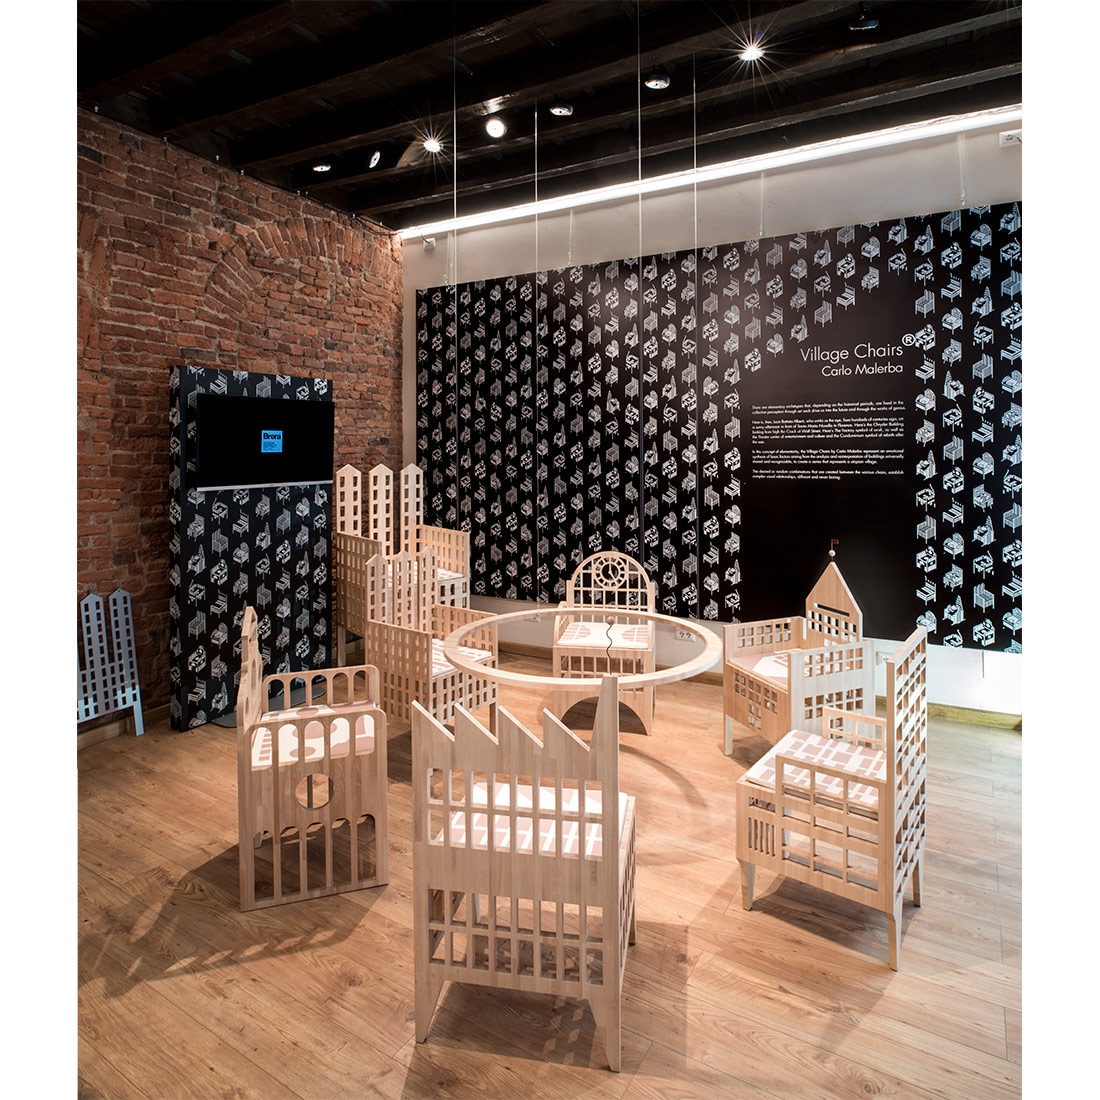 marco-tacchini-photographer-village-chairs-milano_05